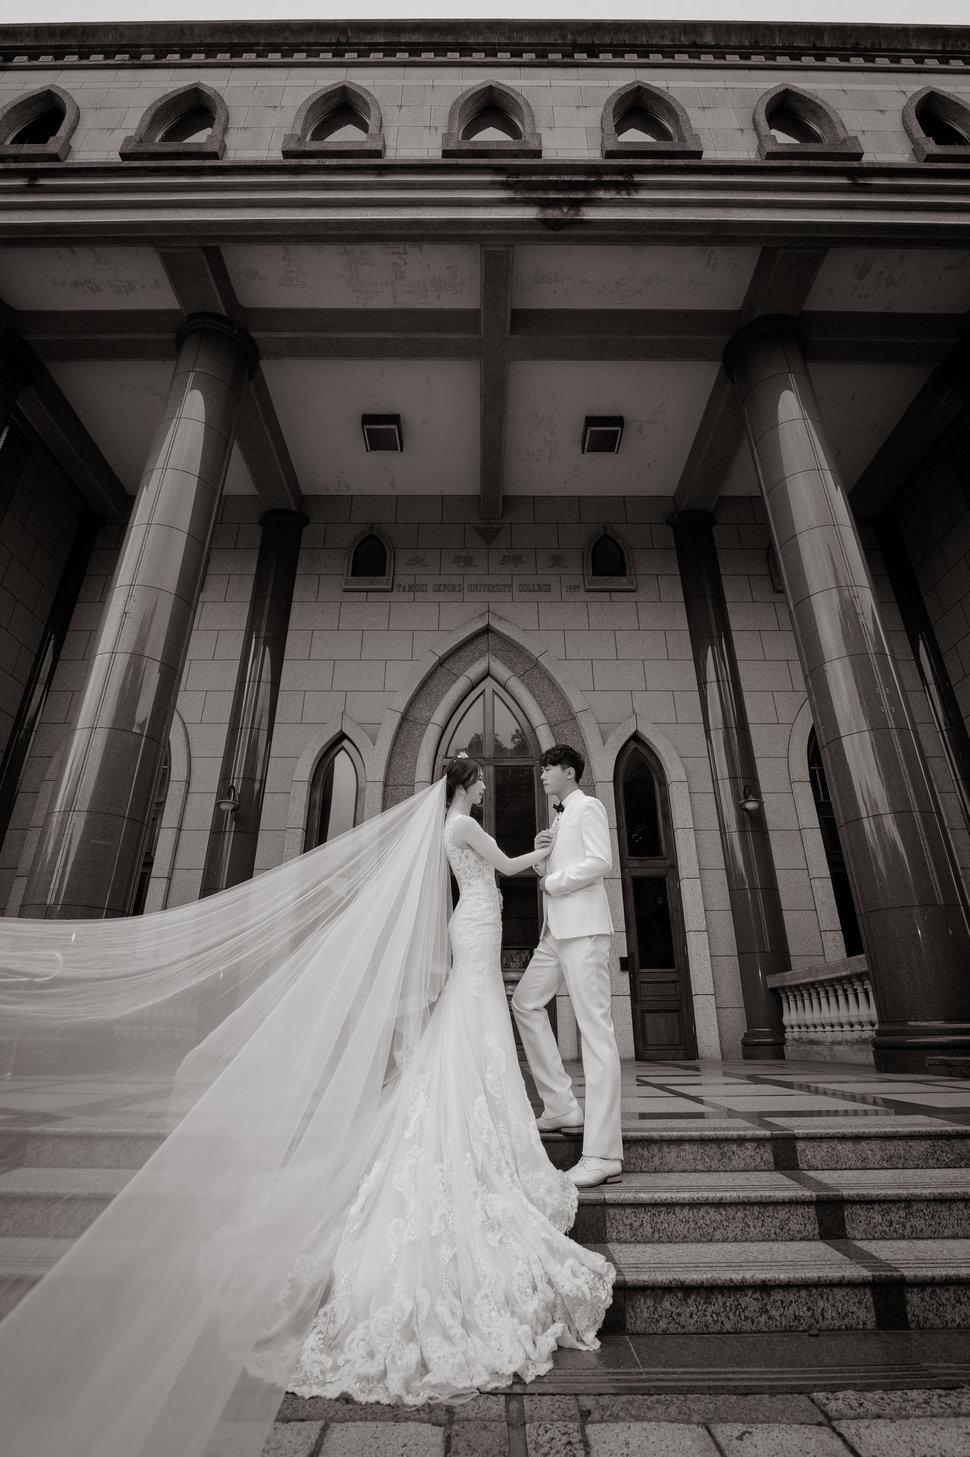 20200111-YEU_5542-1 - 花蓮婚紗 - Sposa Bella《結婚吧》